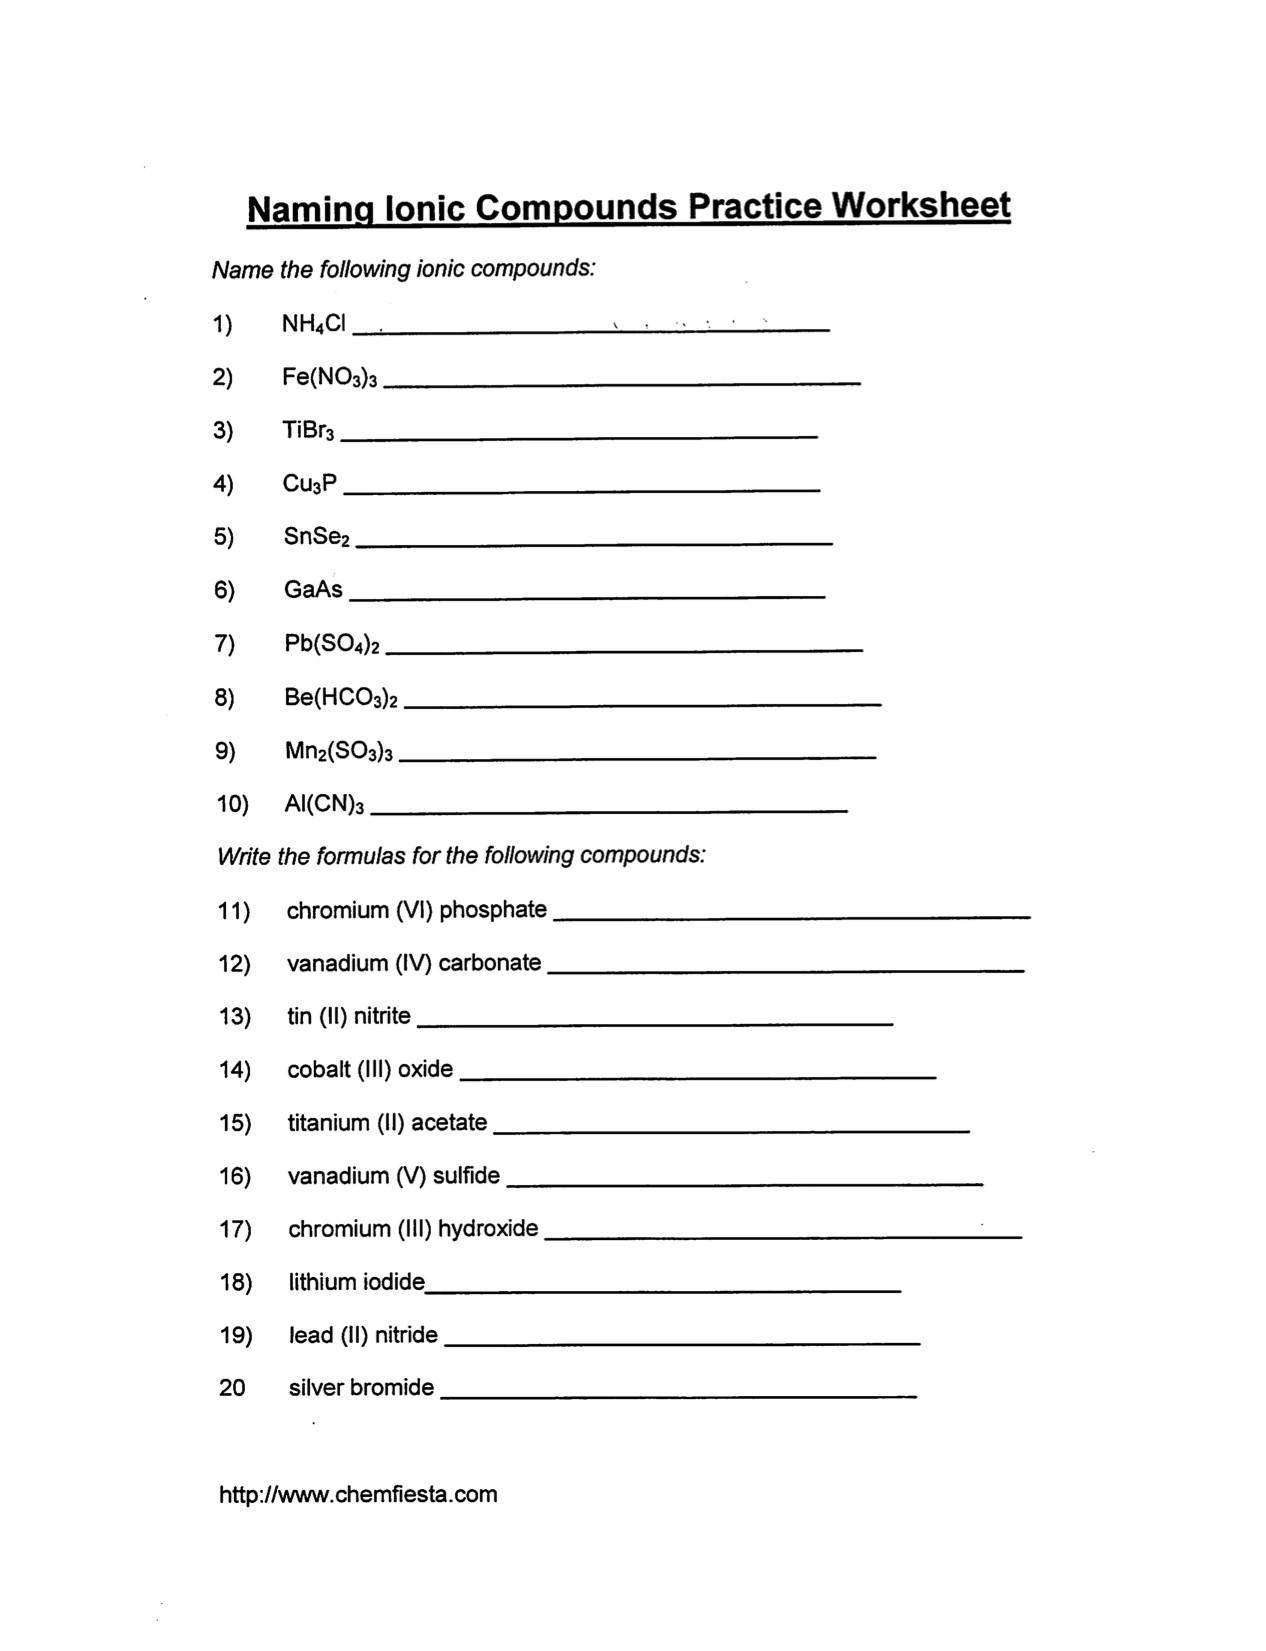 Writing Ionic formulas Worksheet